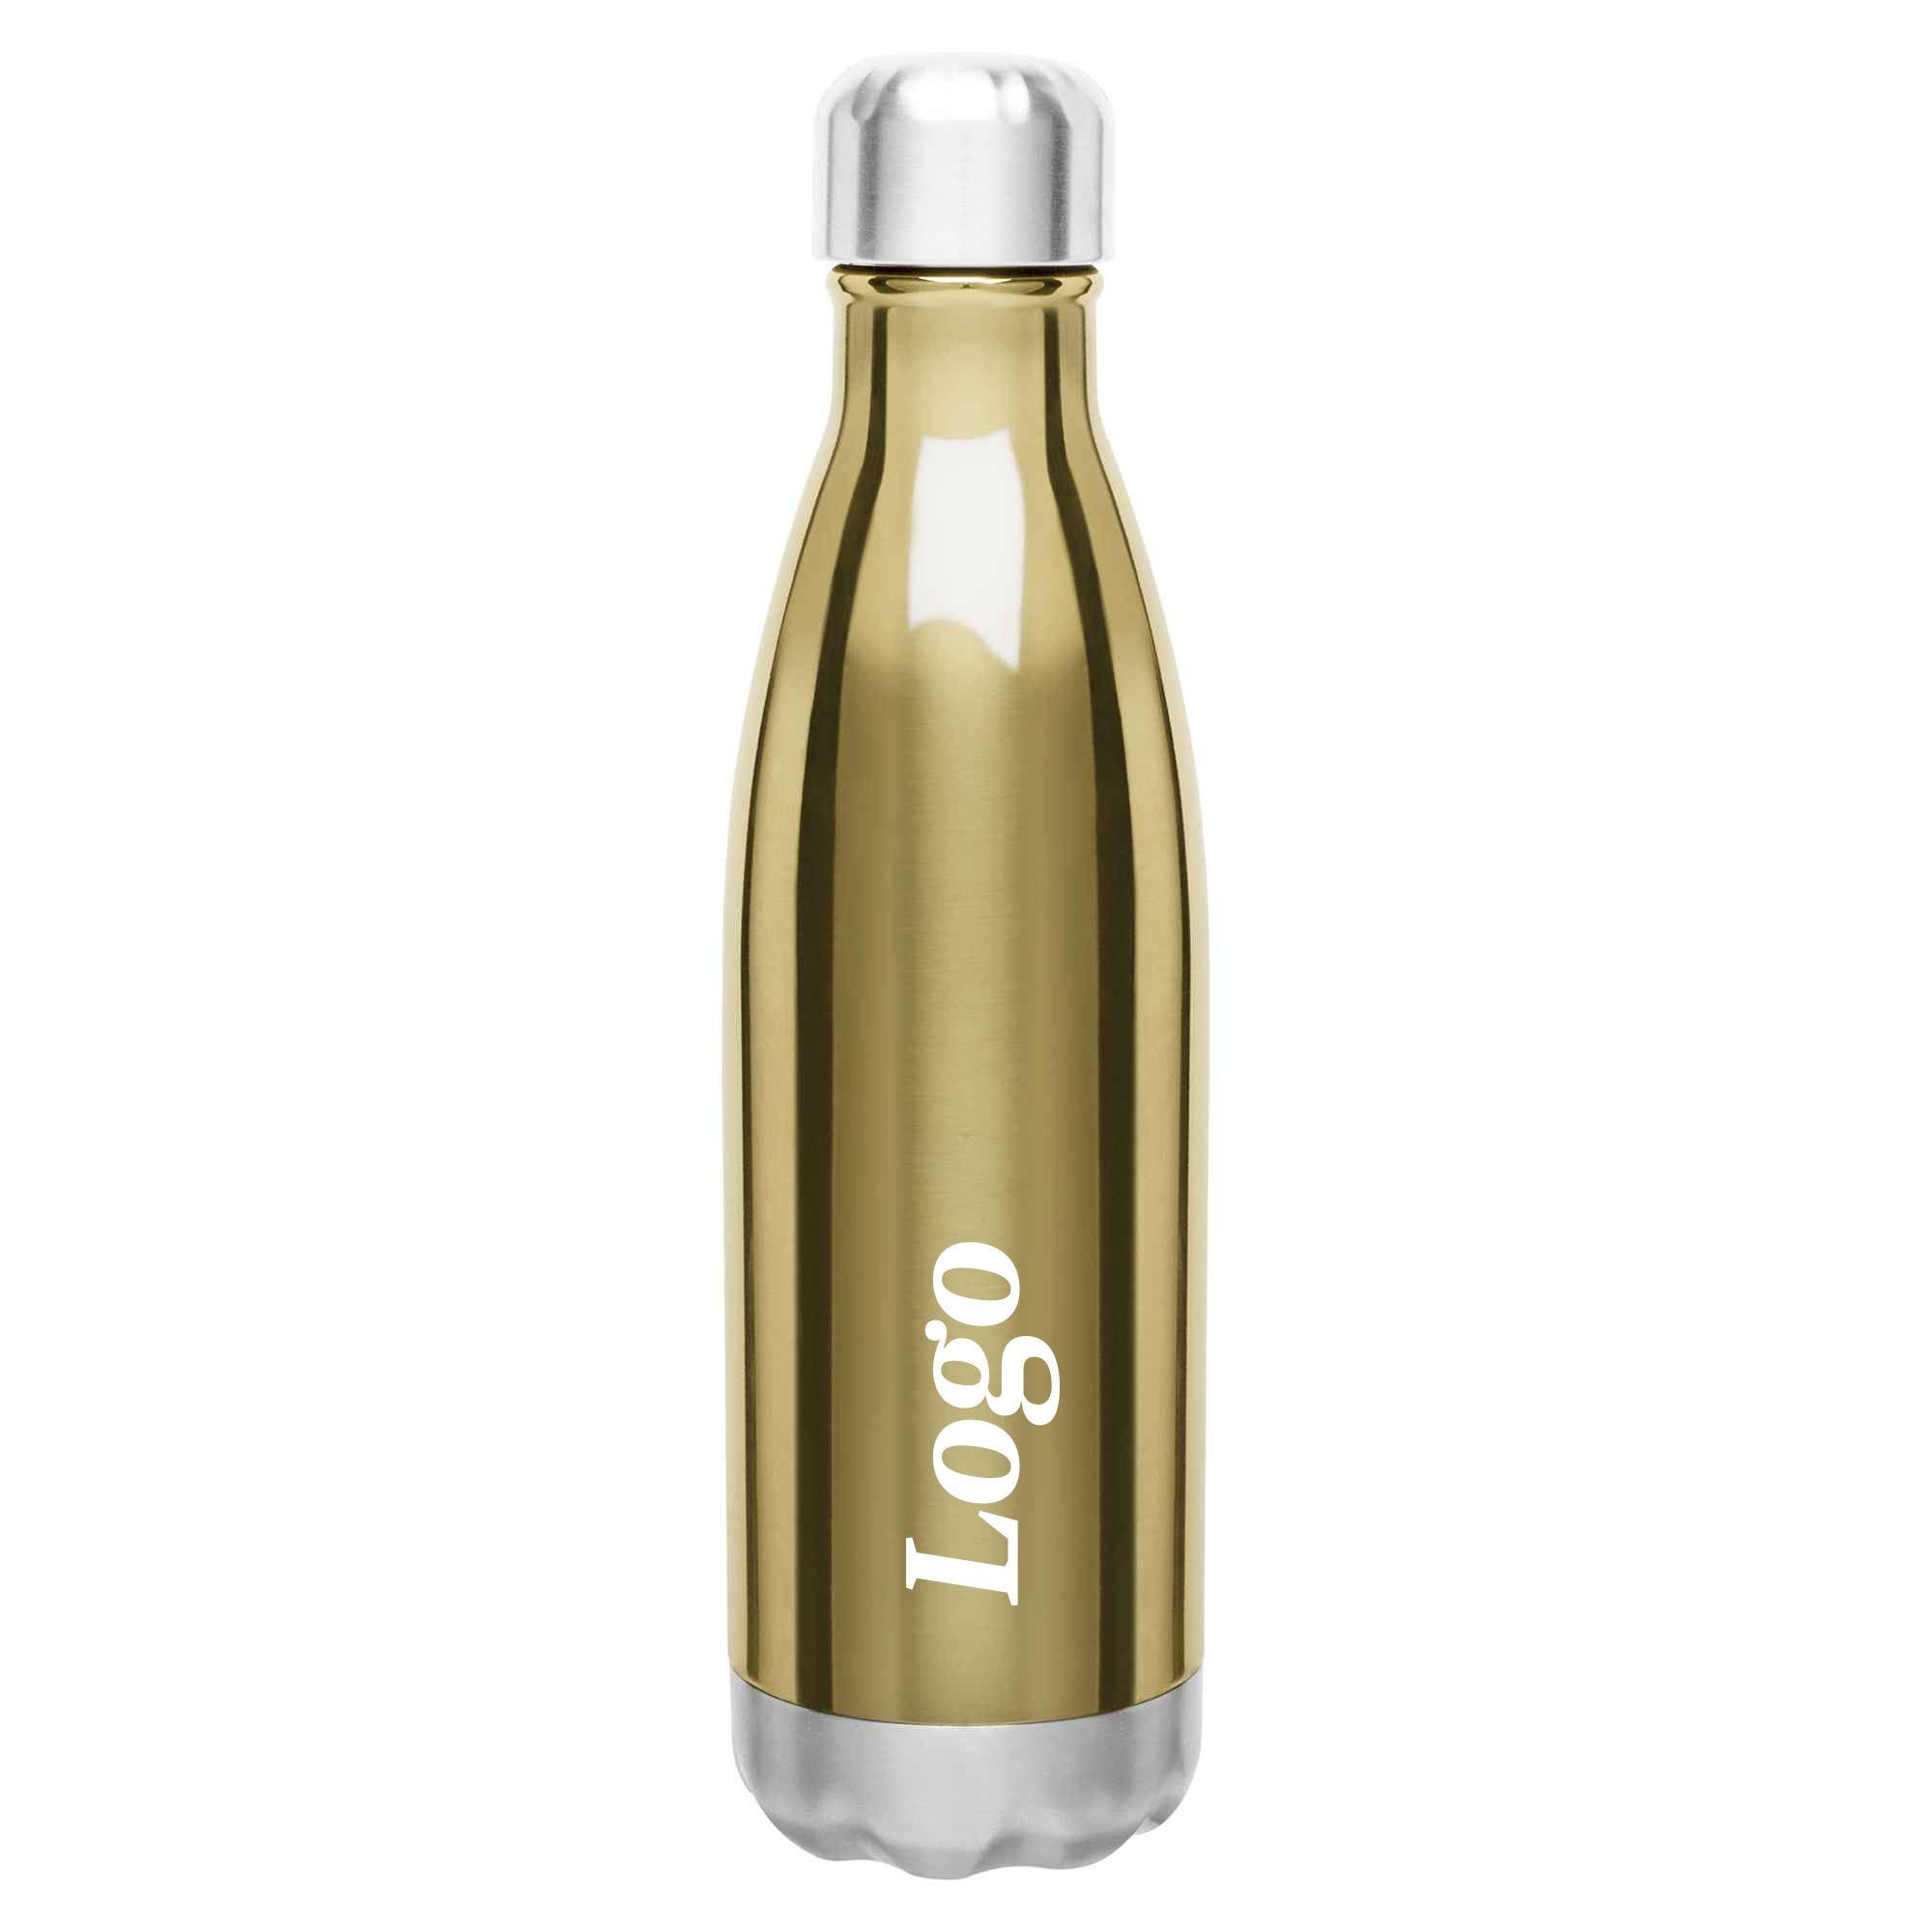 165479 force sparkle bottle one color imprint one locaiton